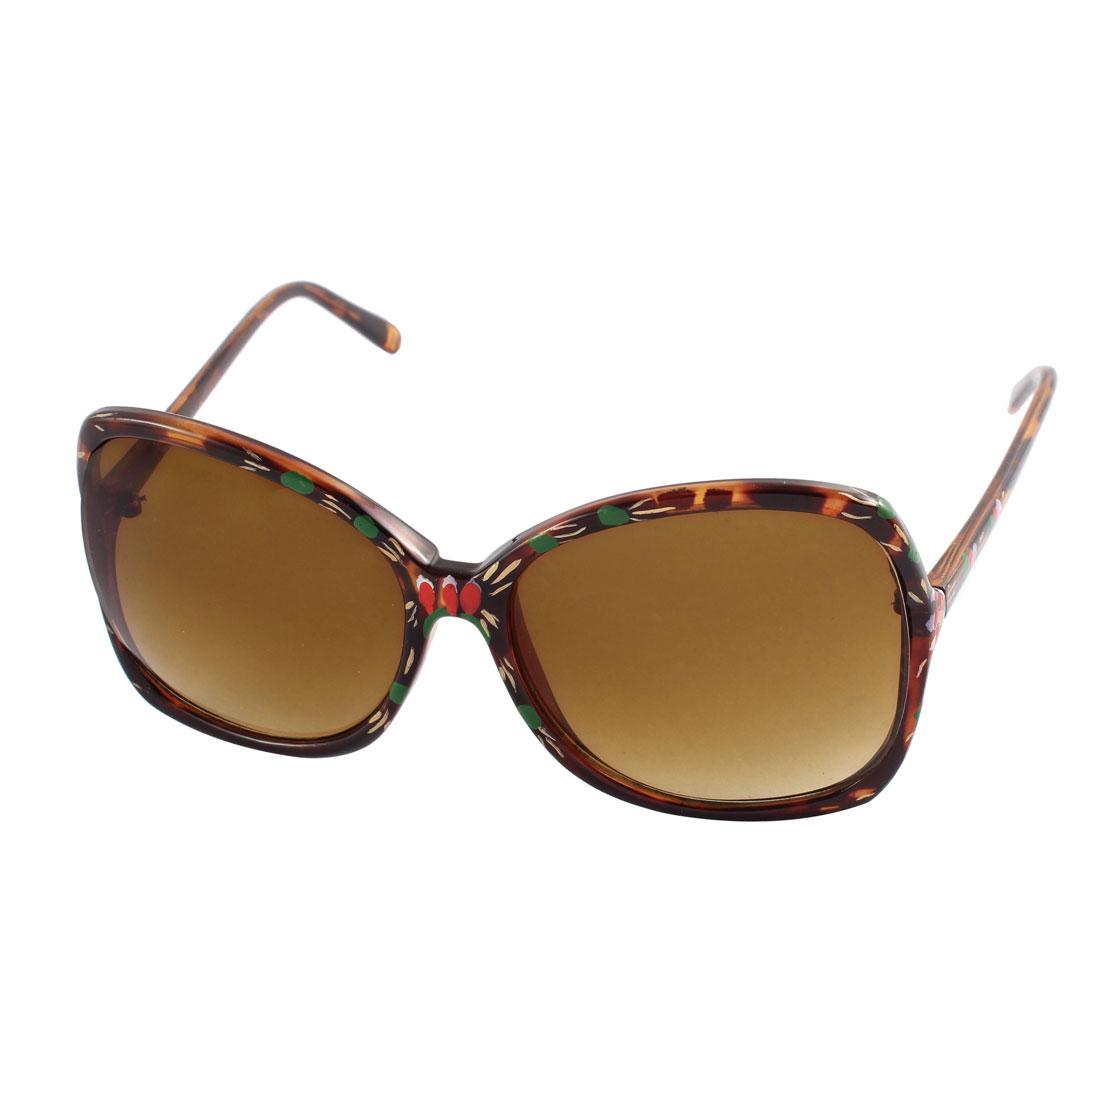 Plastic Booming Flower Printed Full Frame Single Bridge Oval Lens Sunglasses Brown